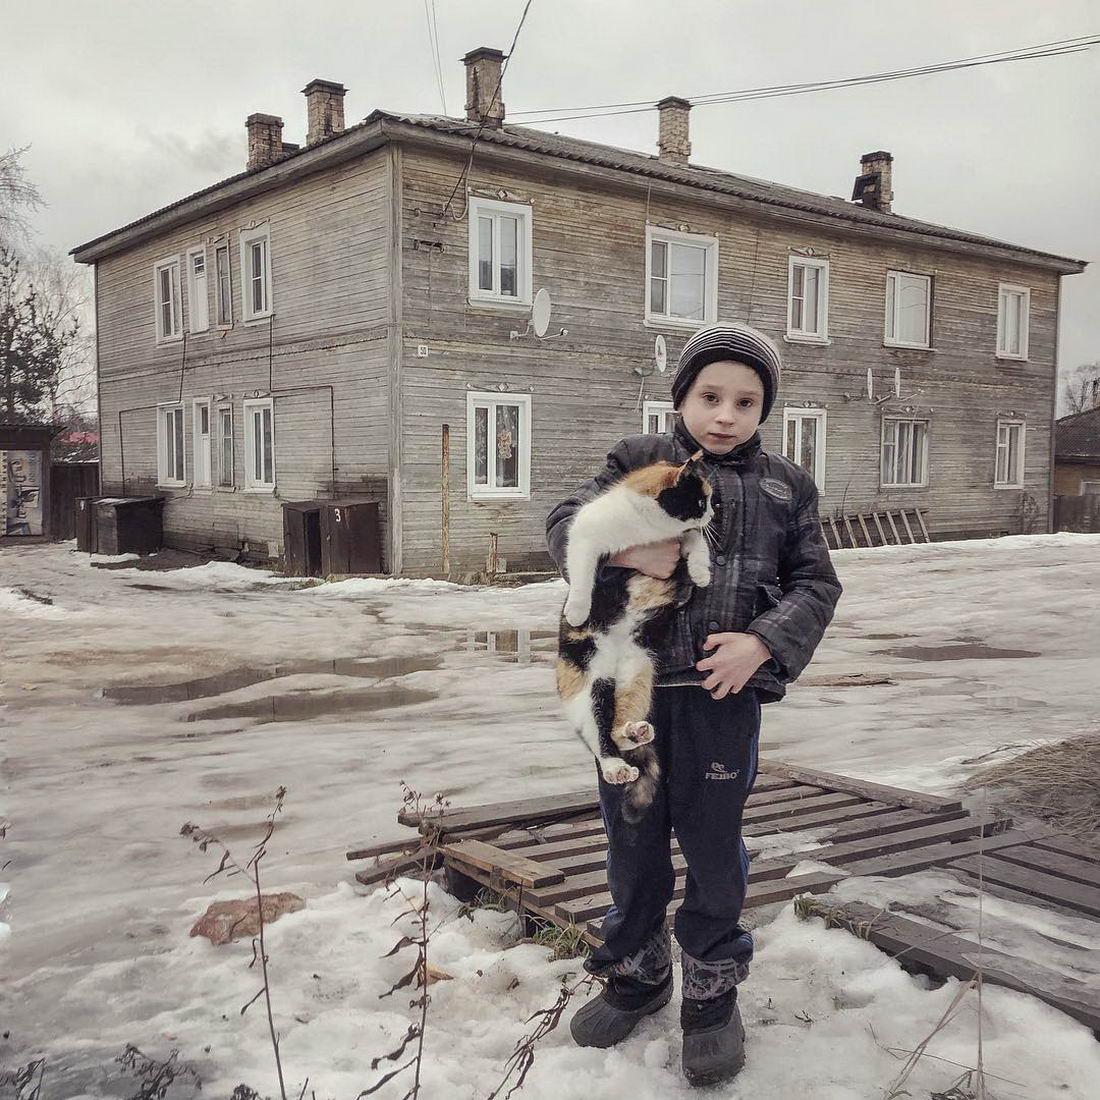 Российская глубинка на снимках Дмитрия Маркова (25 фото)